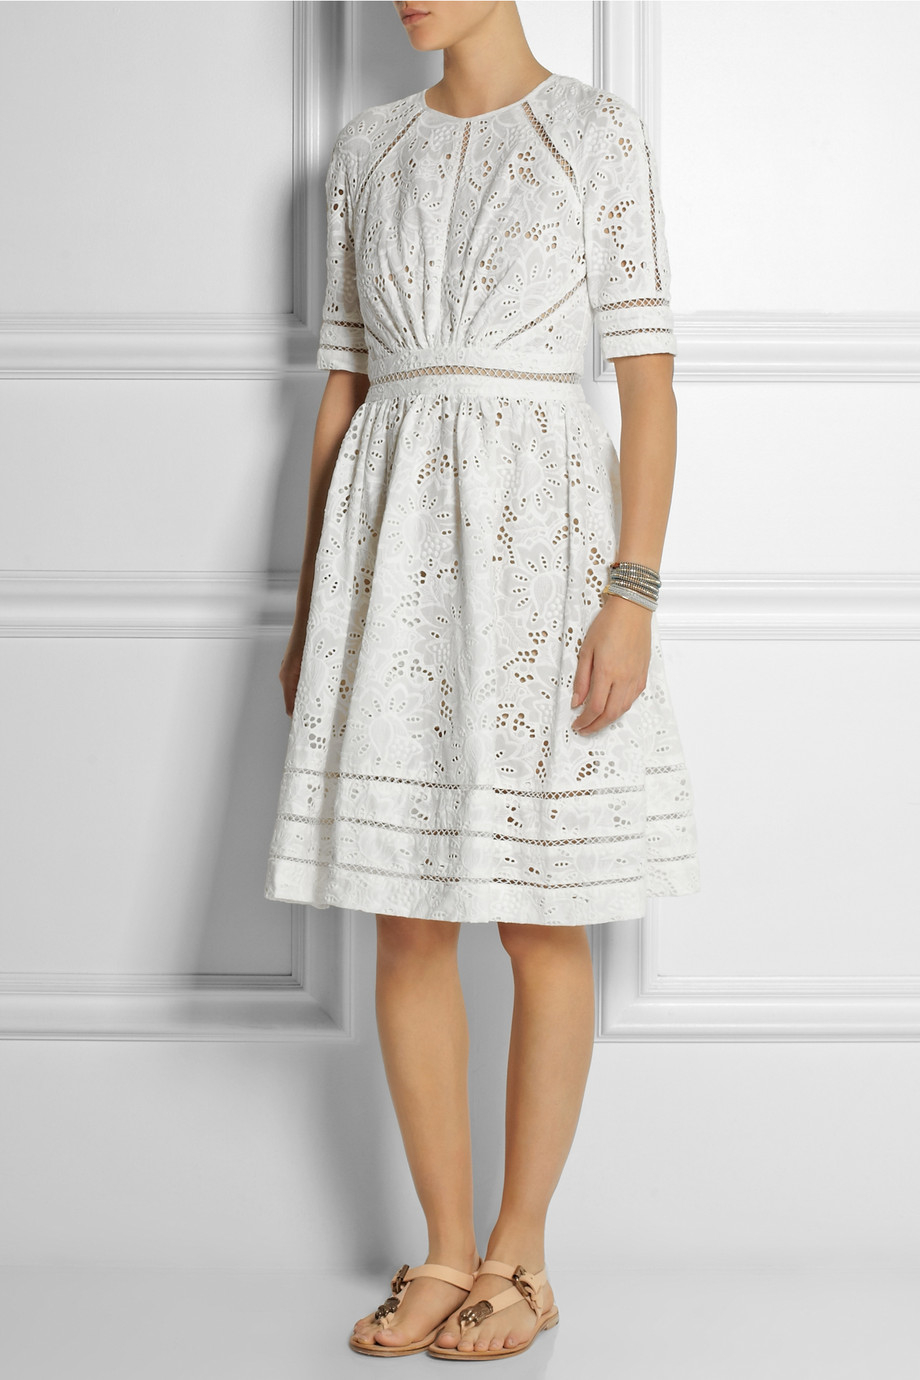 Zimmermann Roamer Broderie Anglaise Cotton Dress In White